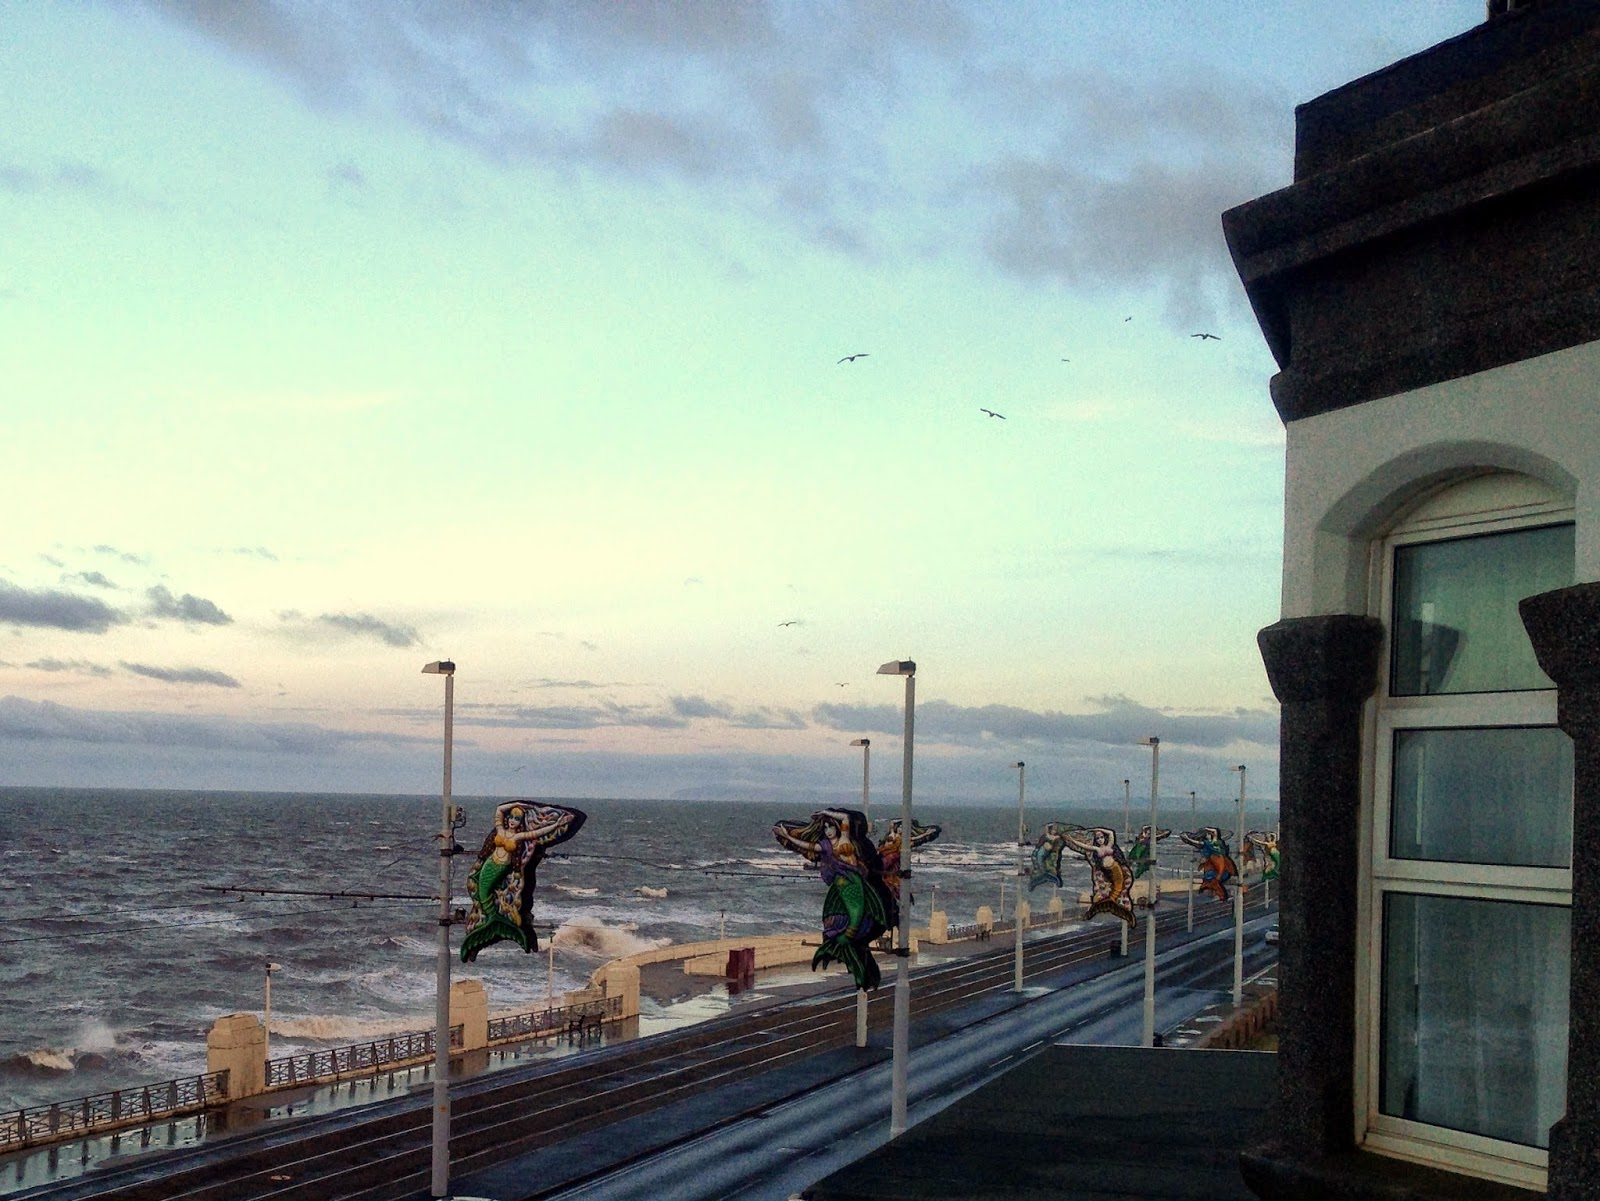 promenade, illuminations, Blackpool, tramway, hotel, hotel view, Strand Hotel,